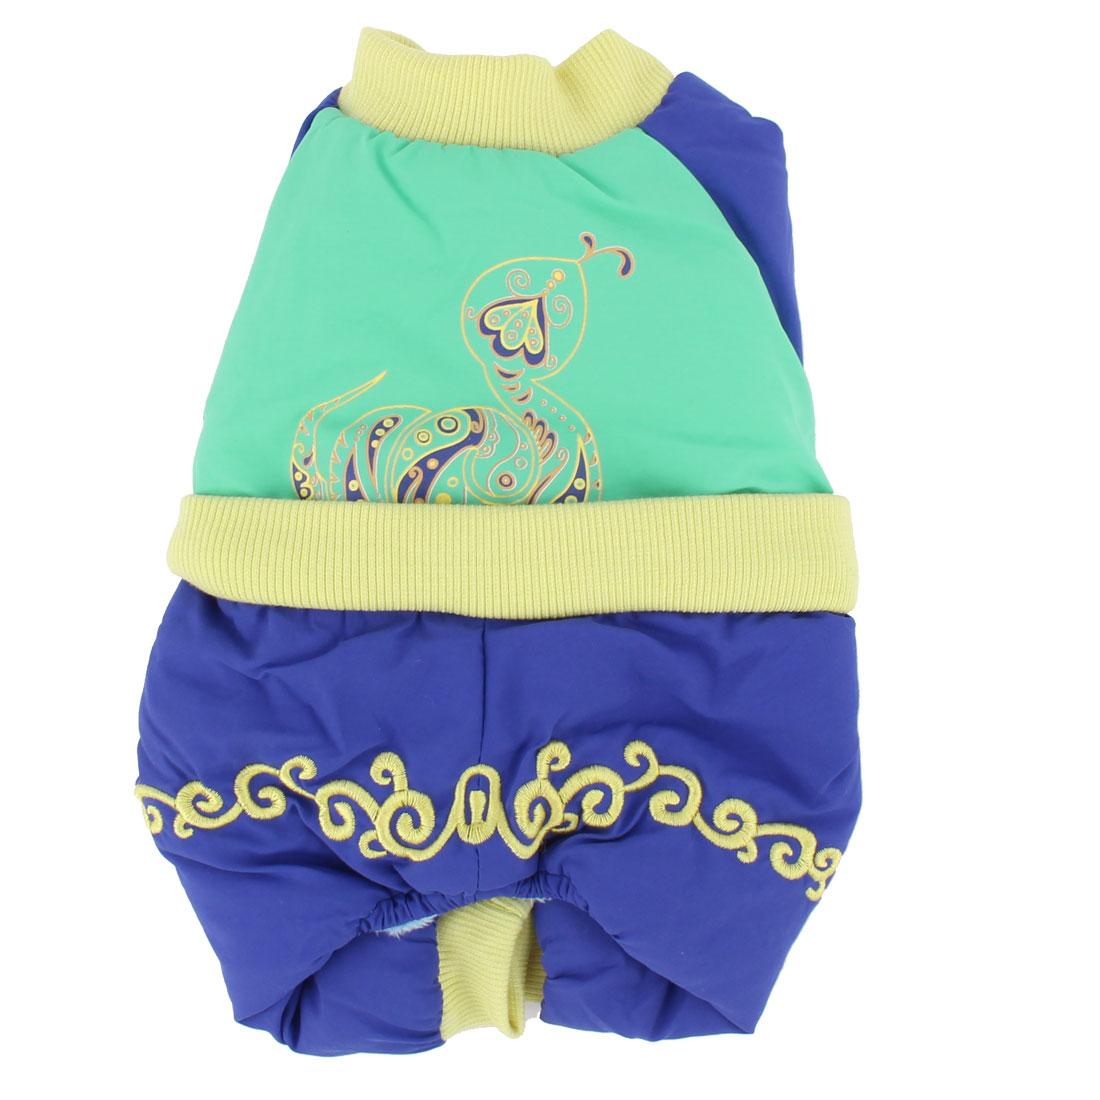 Pet Dog Doggy Cotton Blends Clothes Skirt Coat Dark Blue Green